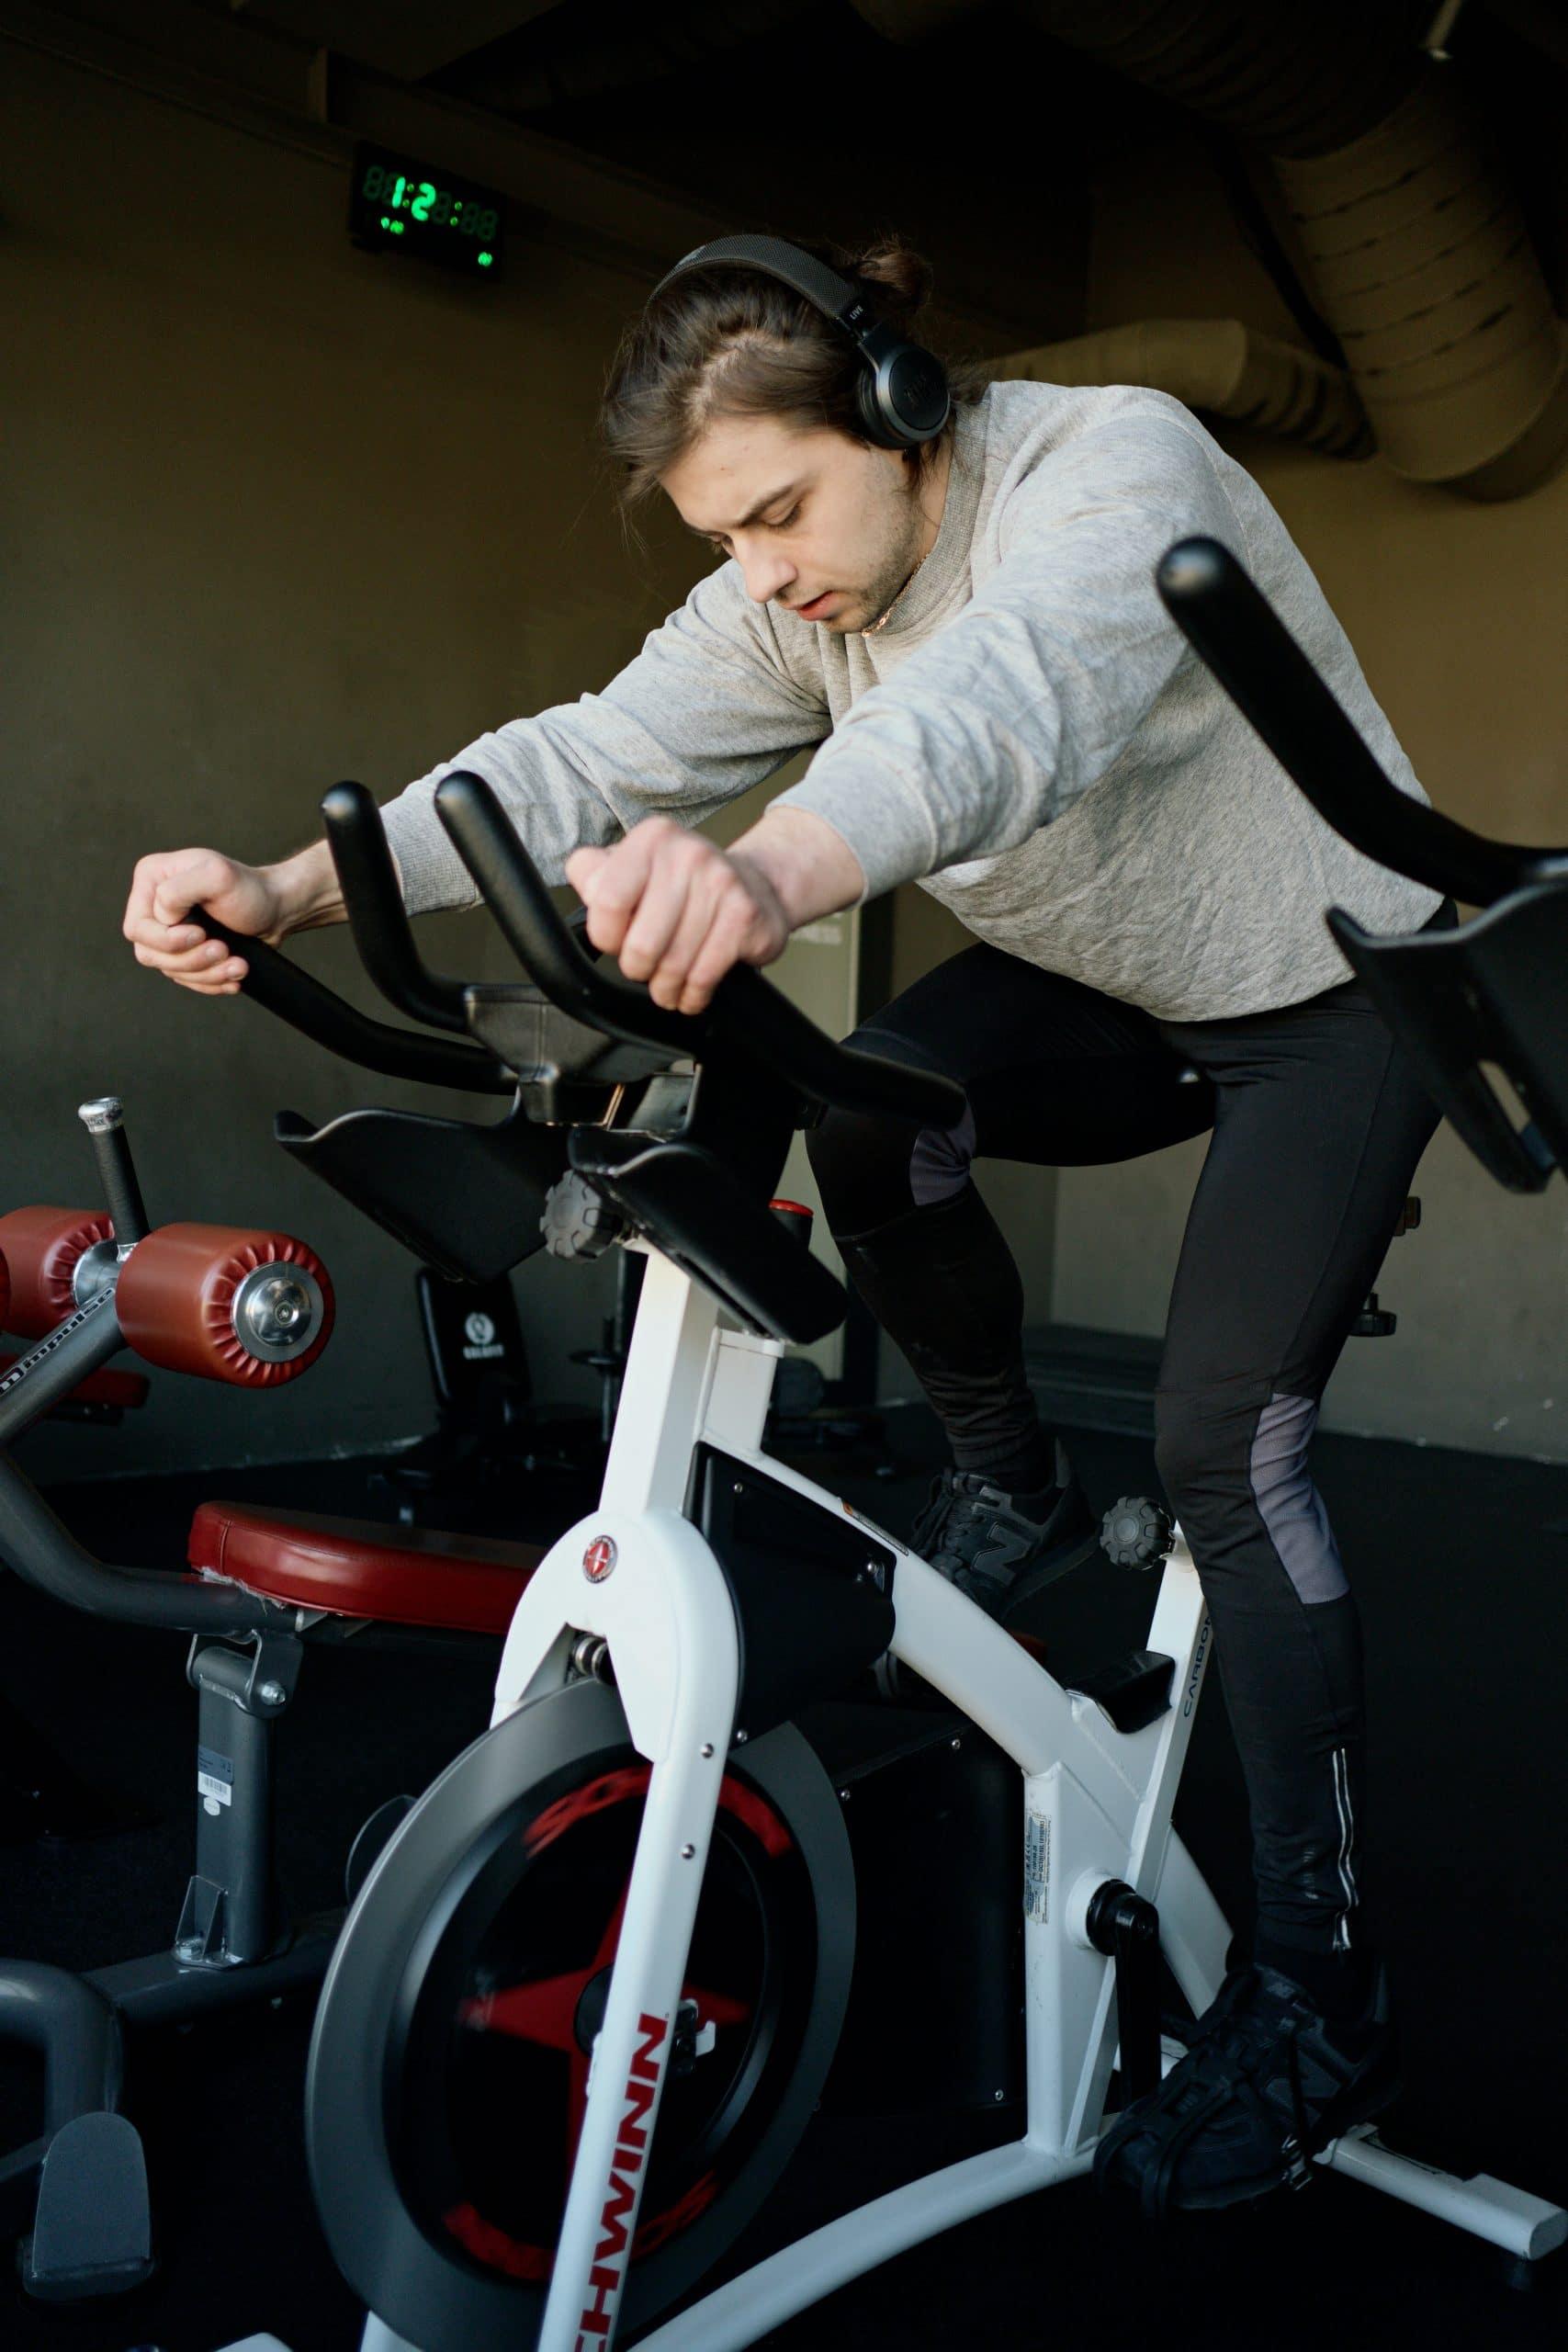 Calories Burned On Exercise Bike Vs Rowing Machine